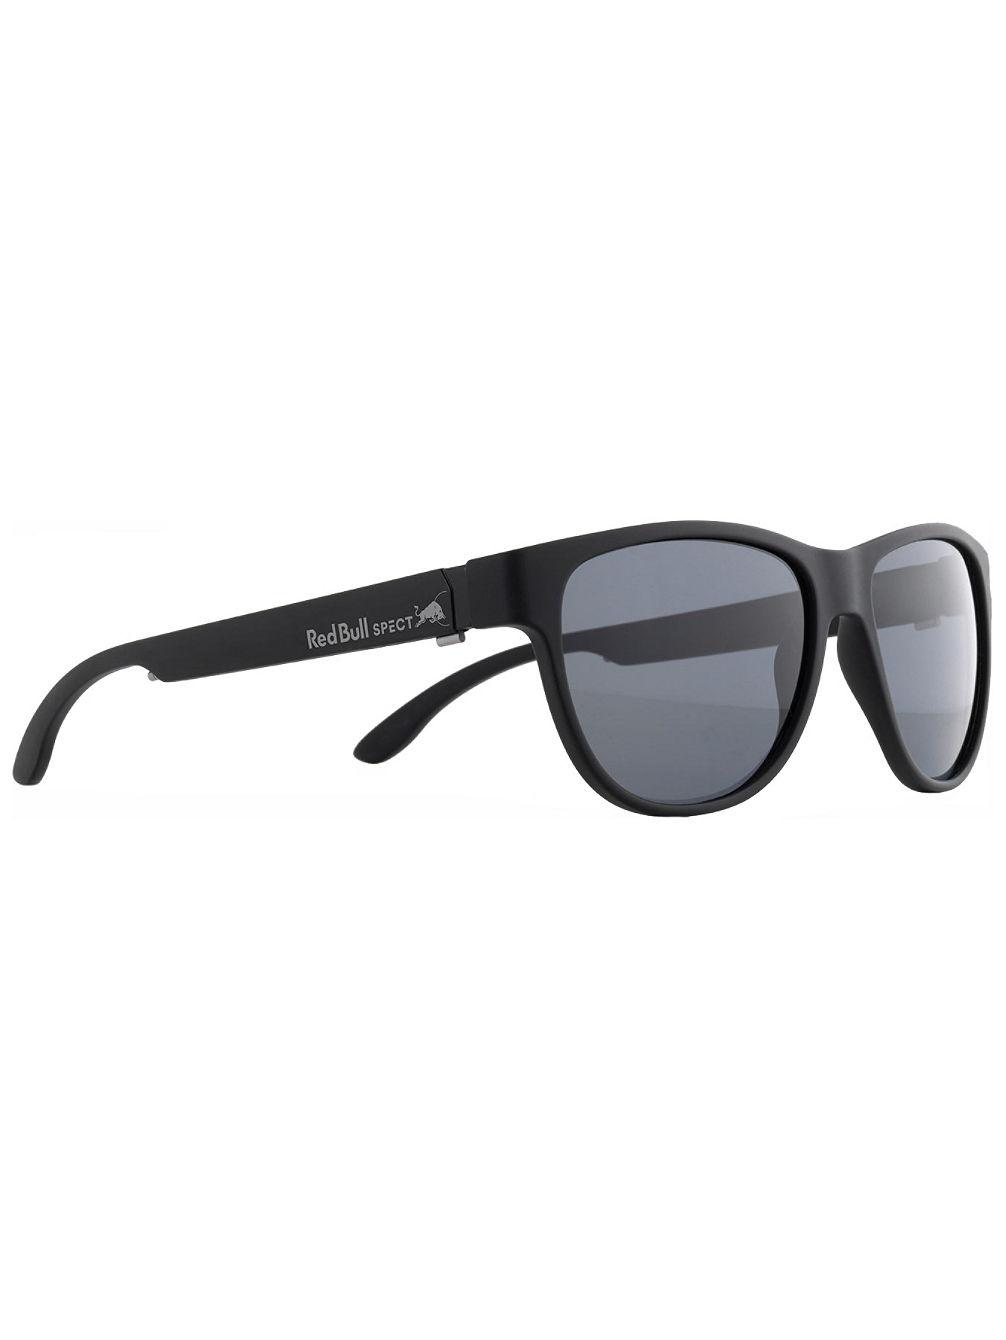 Achetez Red Bull Spect Eyewear Wing3 Black en ligne sur blue-tomato.com fd864f46afdb